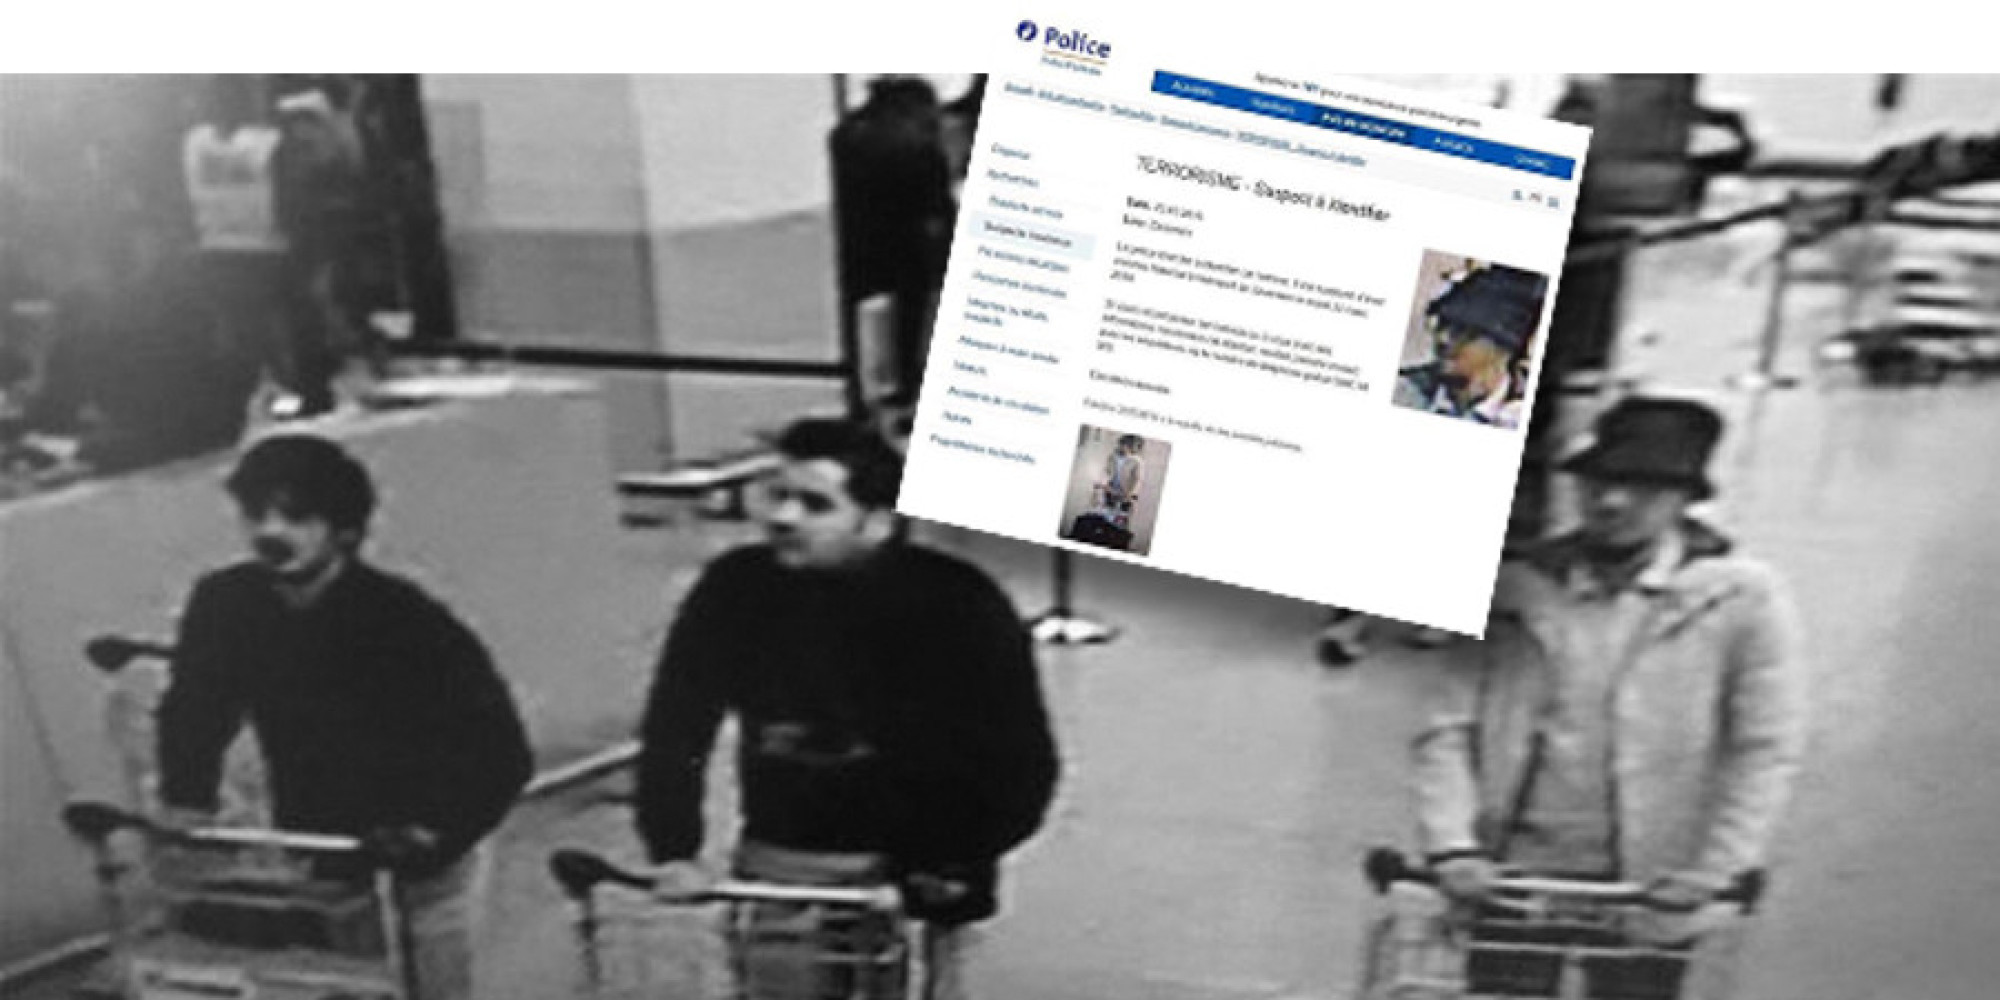 Attentat Facebook: Attentat à L'aéroport De Bruxelles : Un Suspect